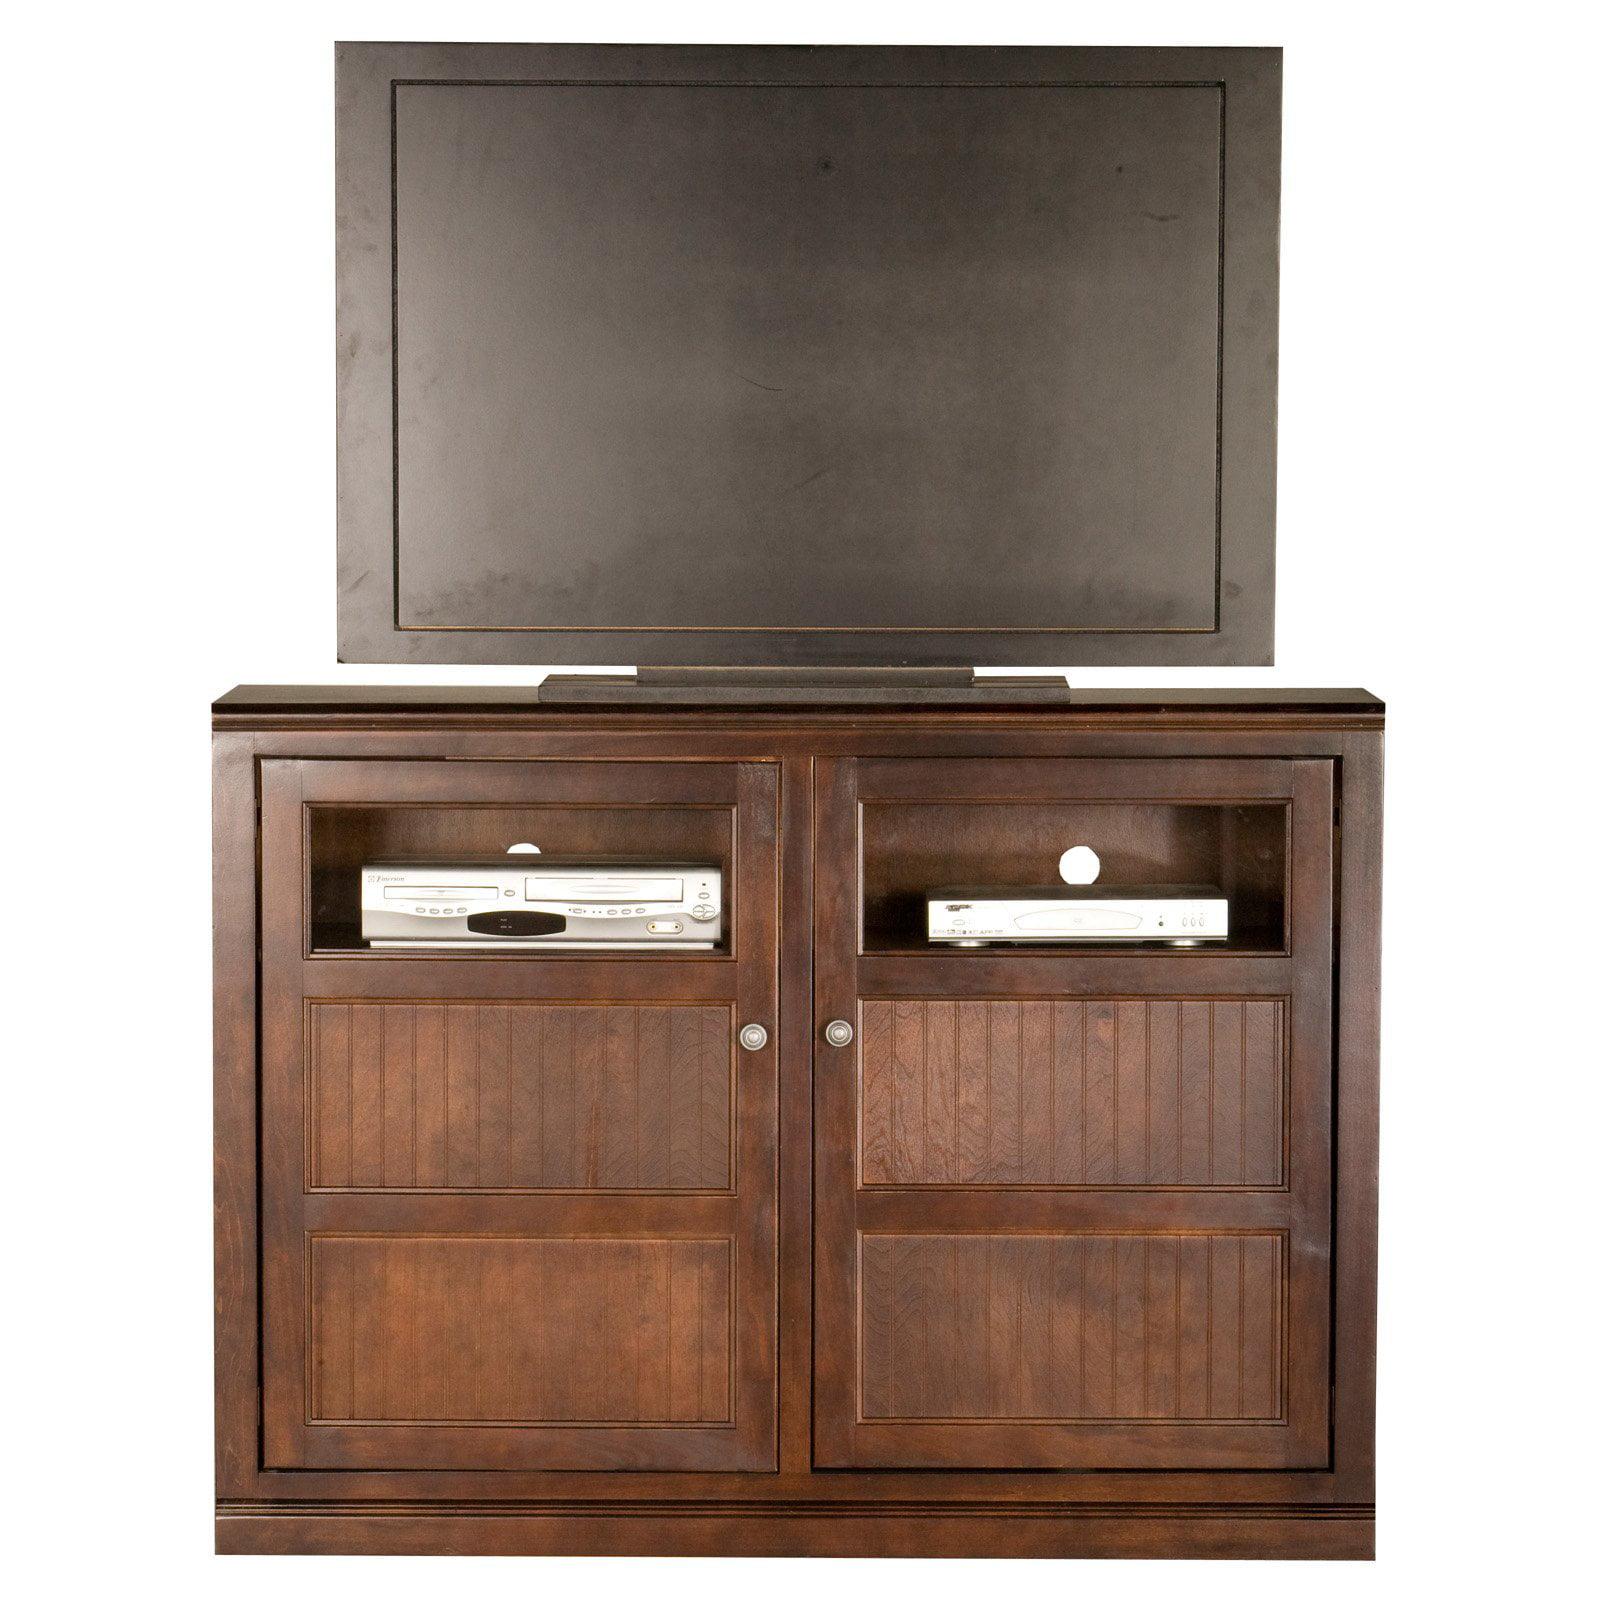 Eagle Furniture Coastal 55 in. Flat-Panel Entertainment Center